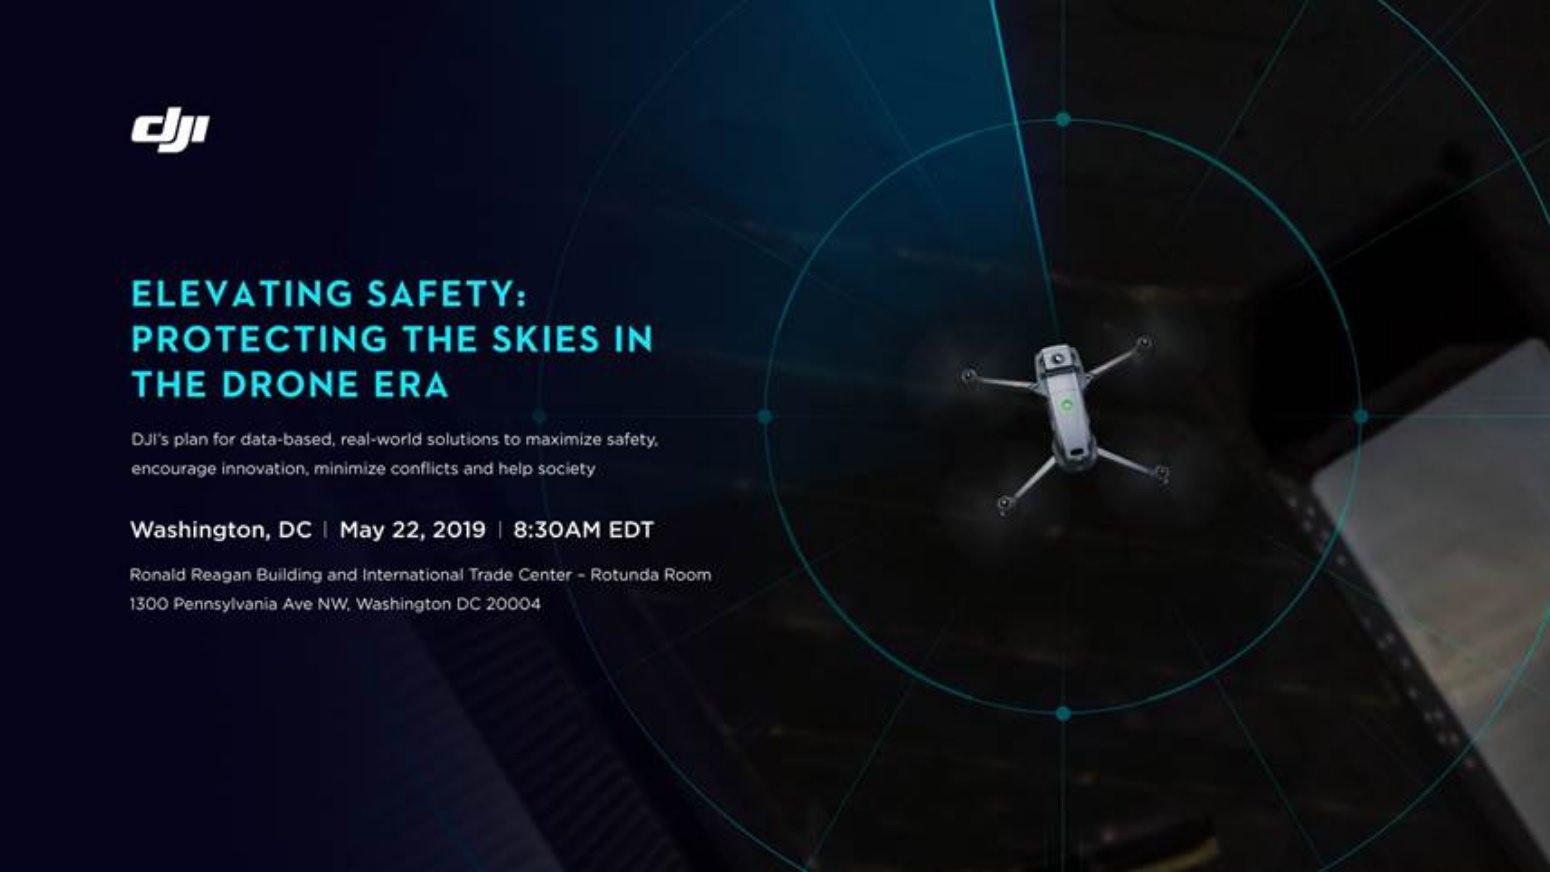 New Dji Drone 2020 DJI will include ADS B receivers in all DJI drones over 250 grams